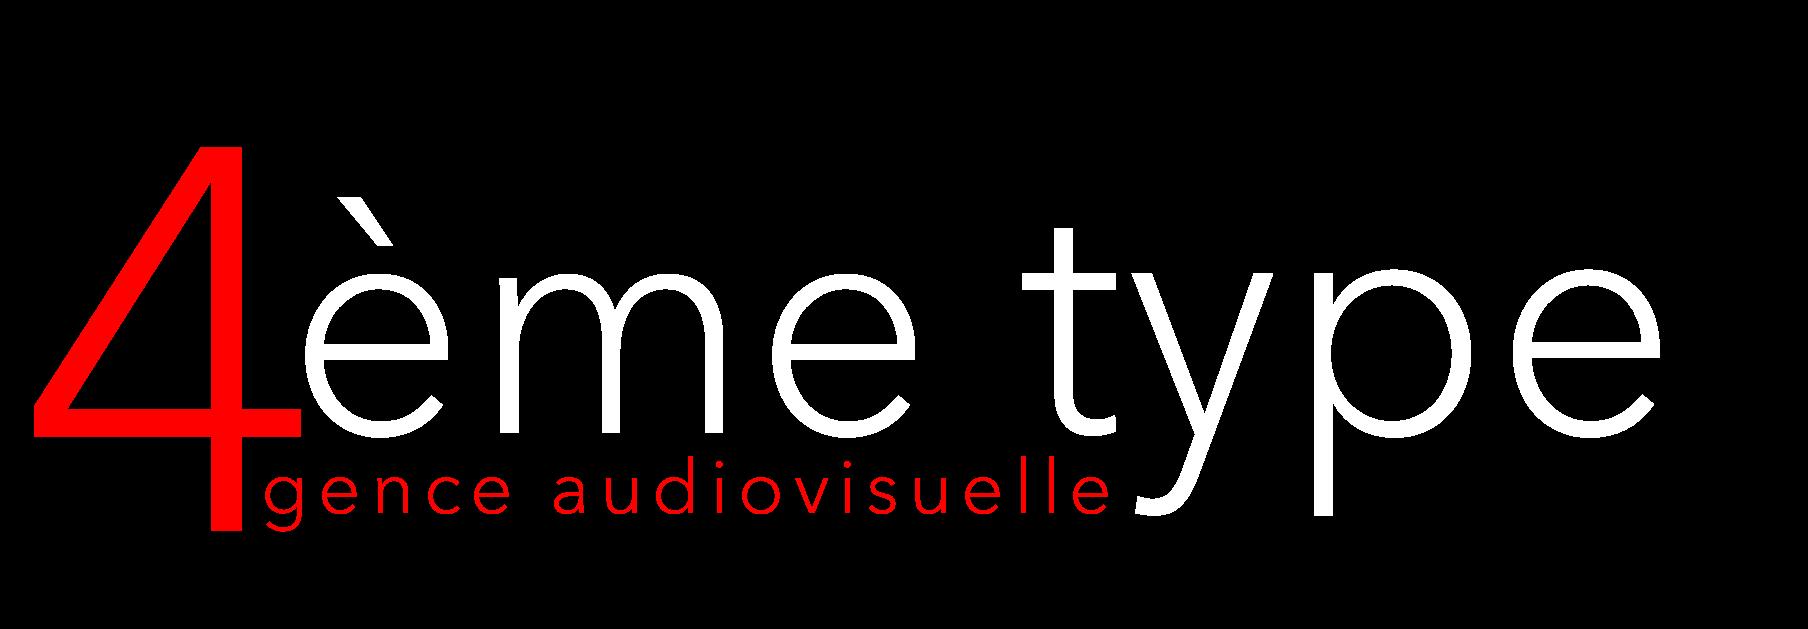 4eme type